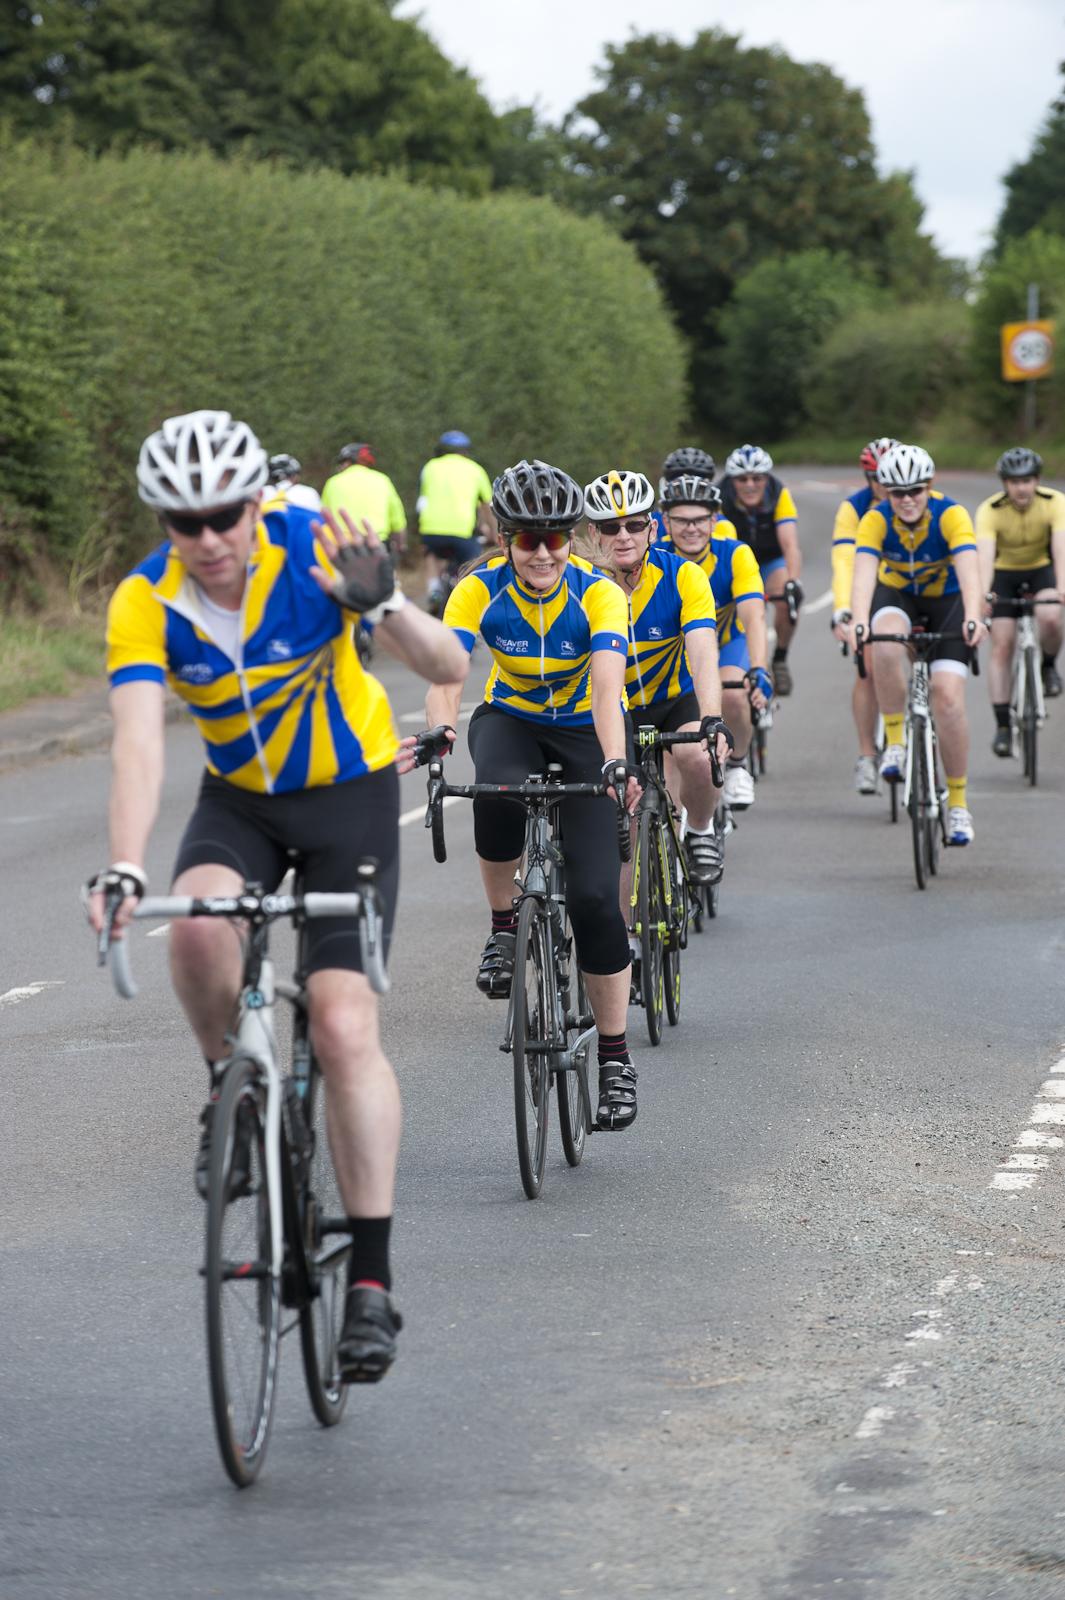 Bl**dy cyclists...!